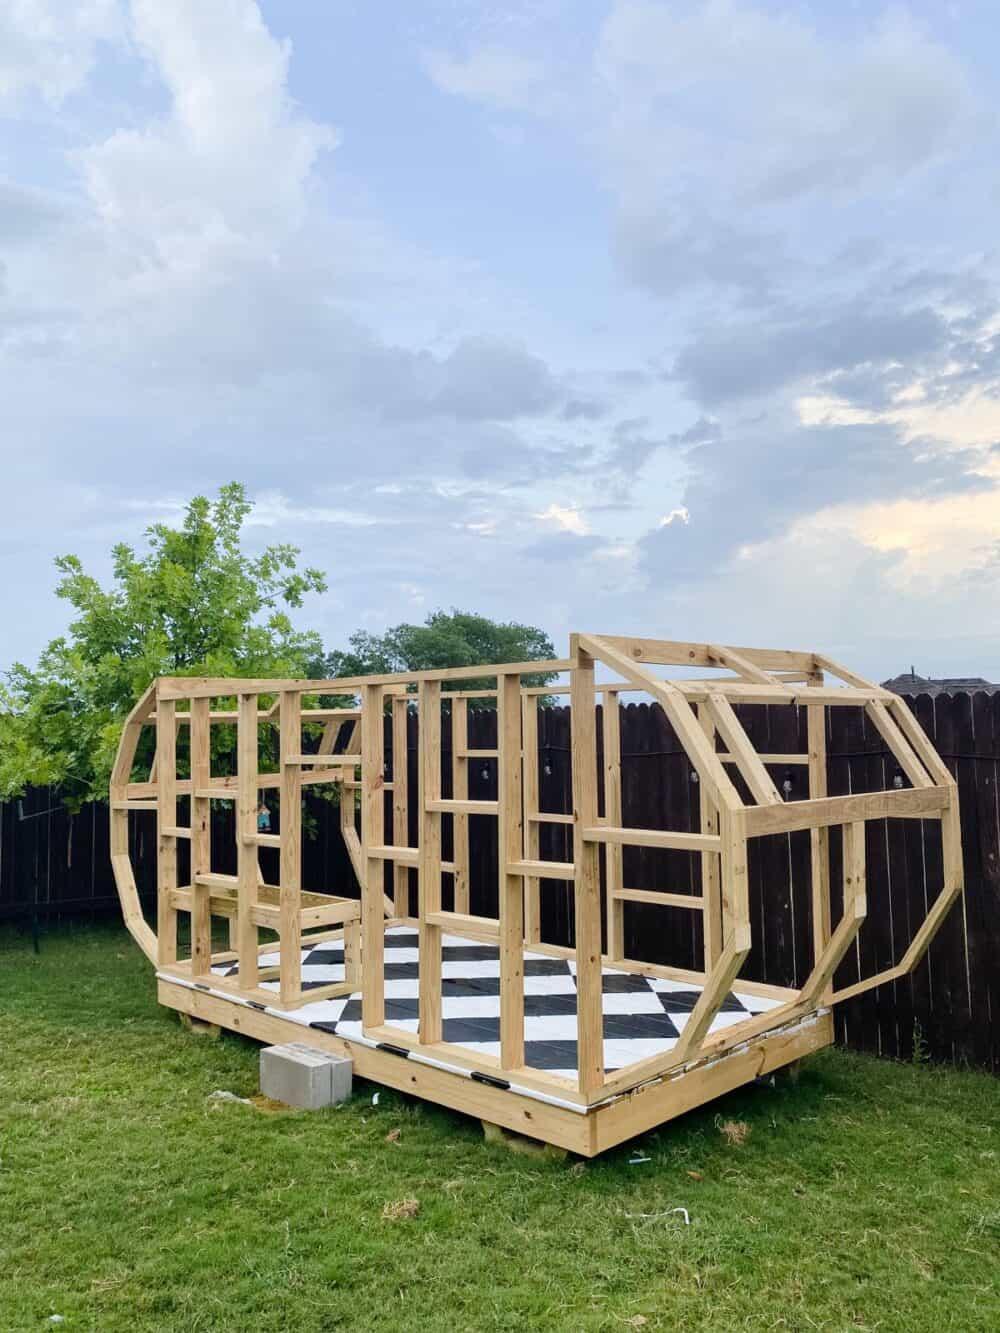 Framing of vintage-style camper playhouse